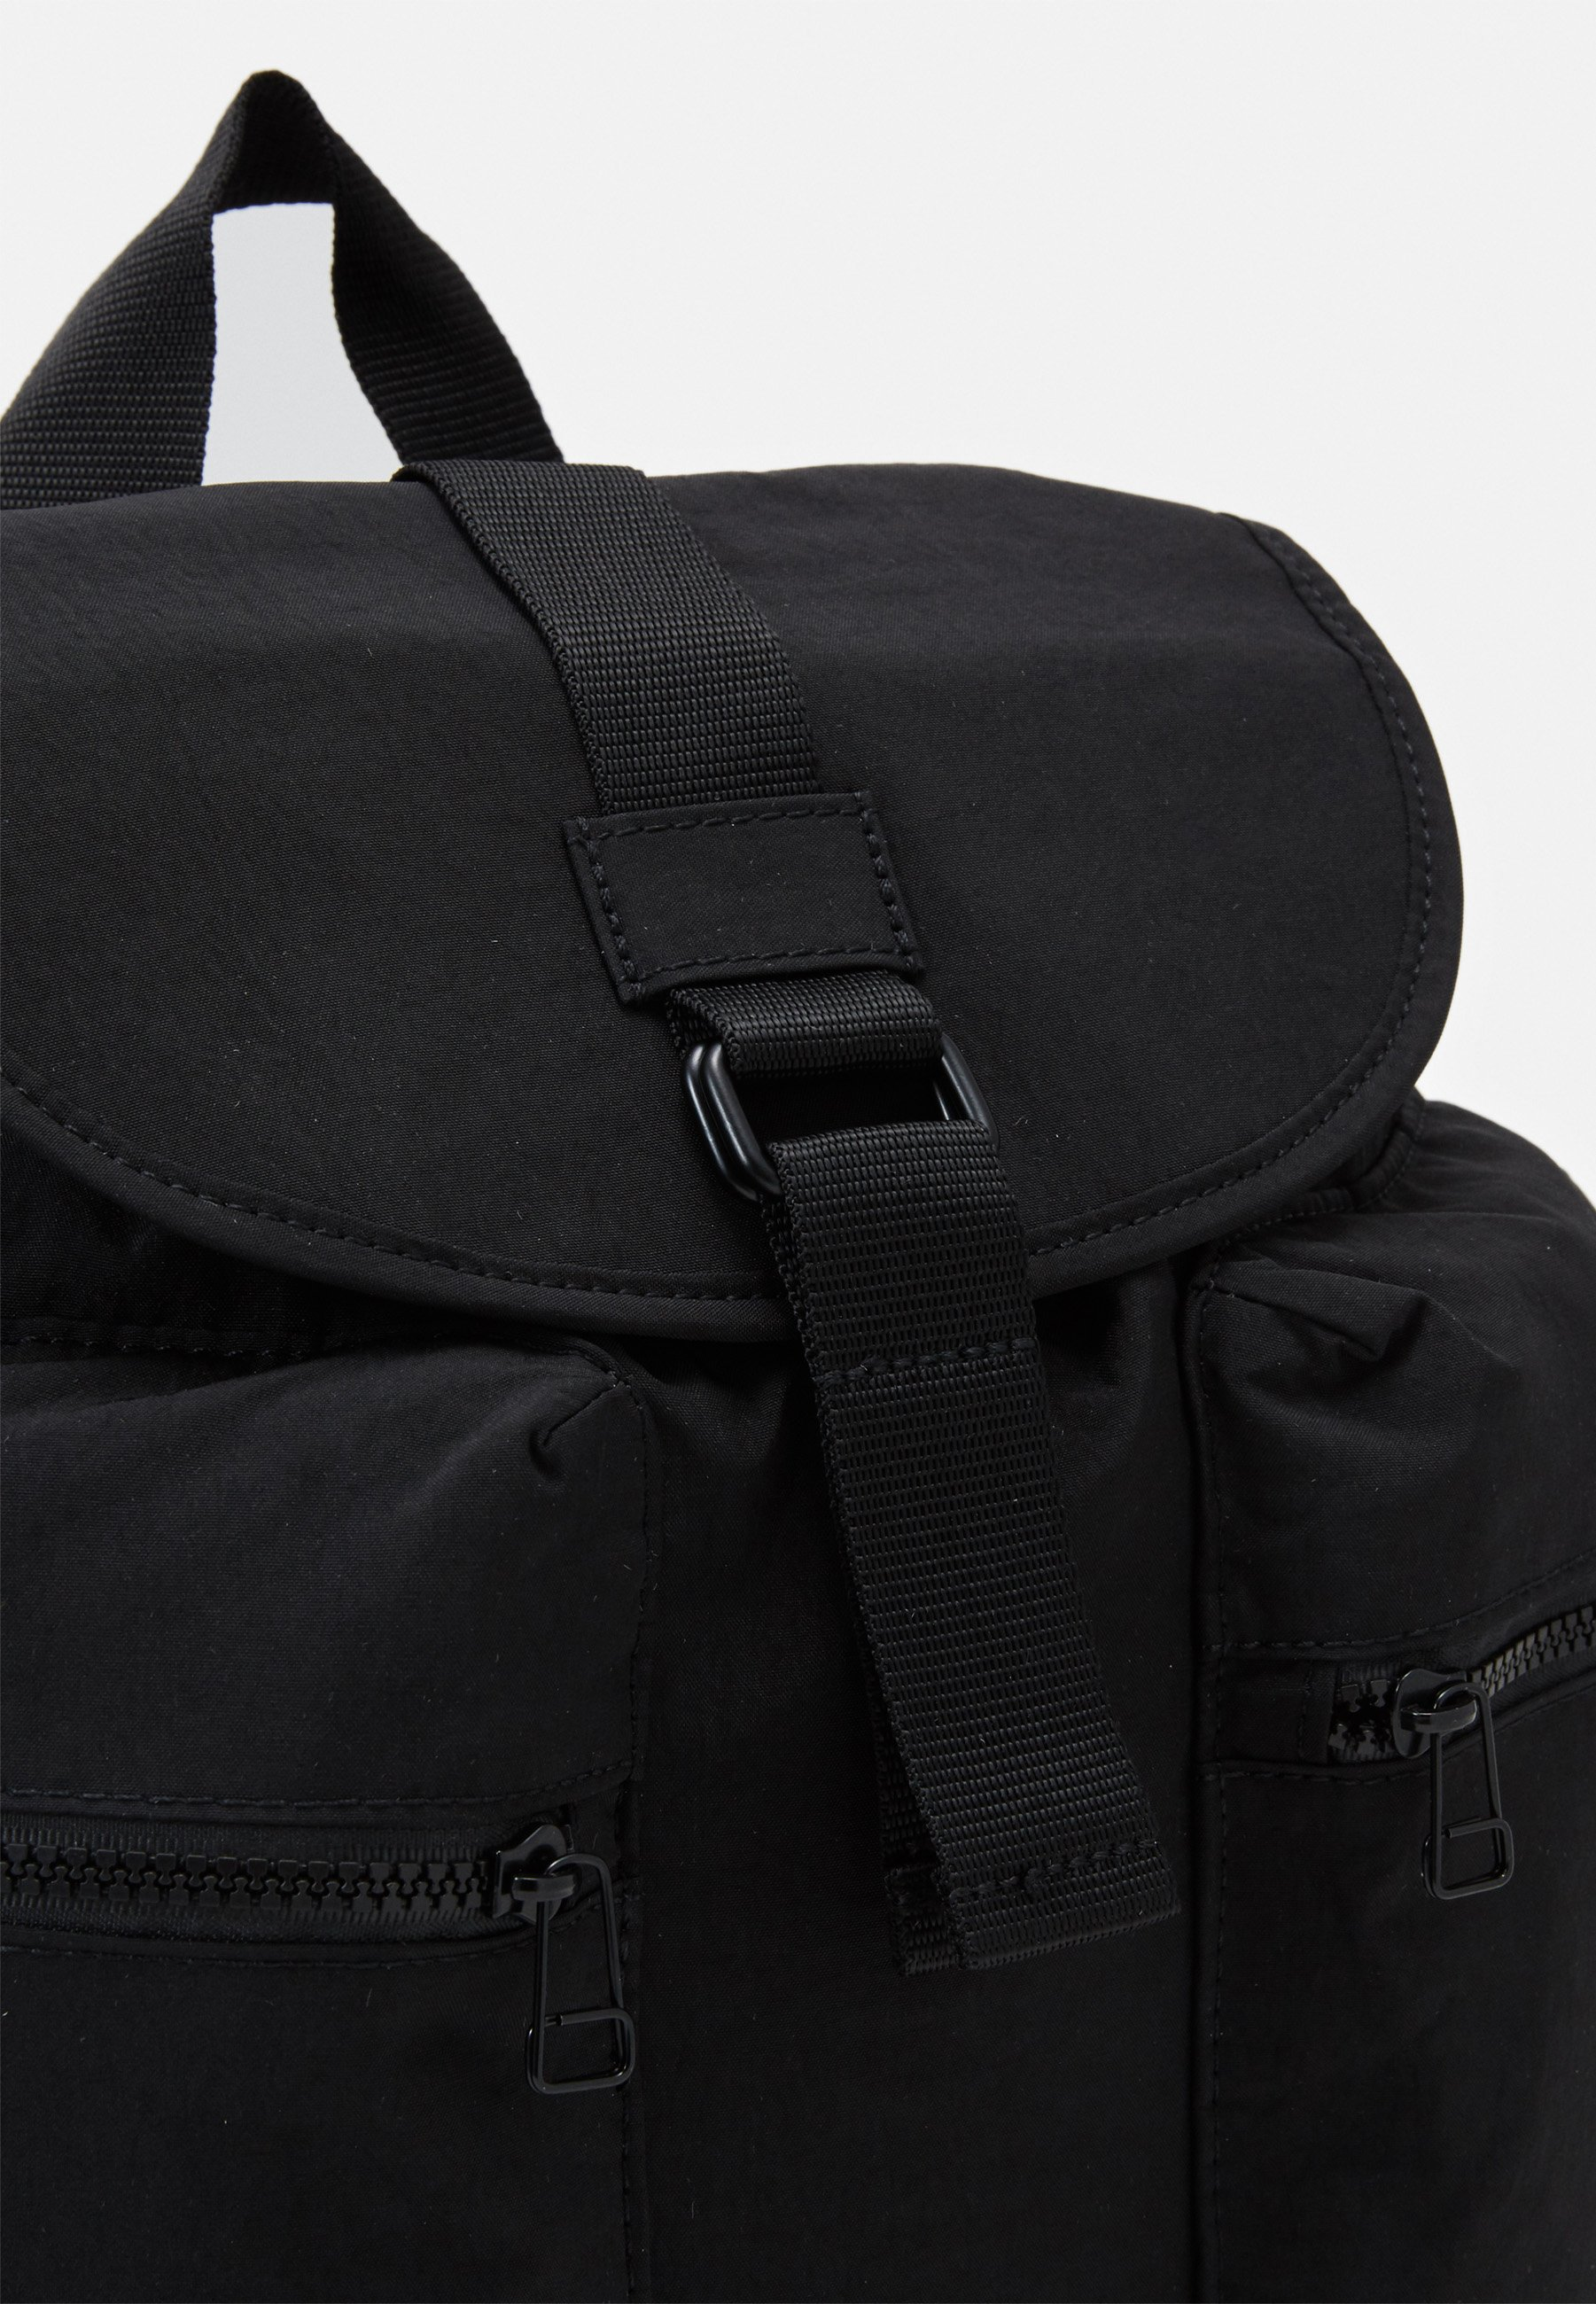 Zign Ryggsekk - black/svart Tc4NegxK2m80LRb